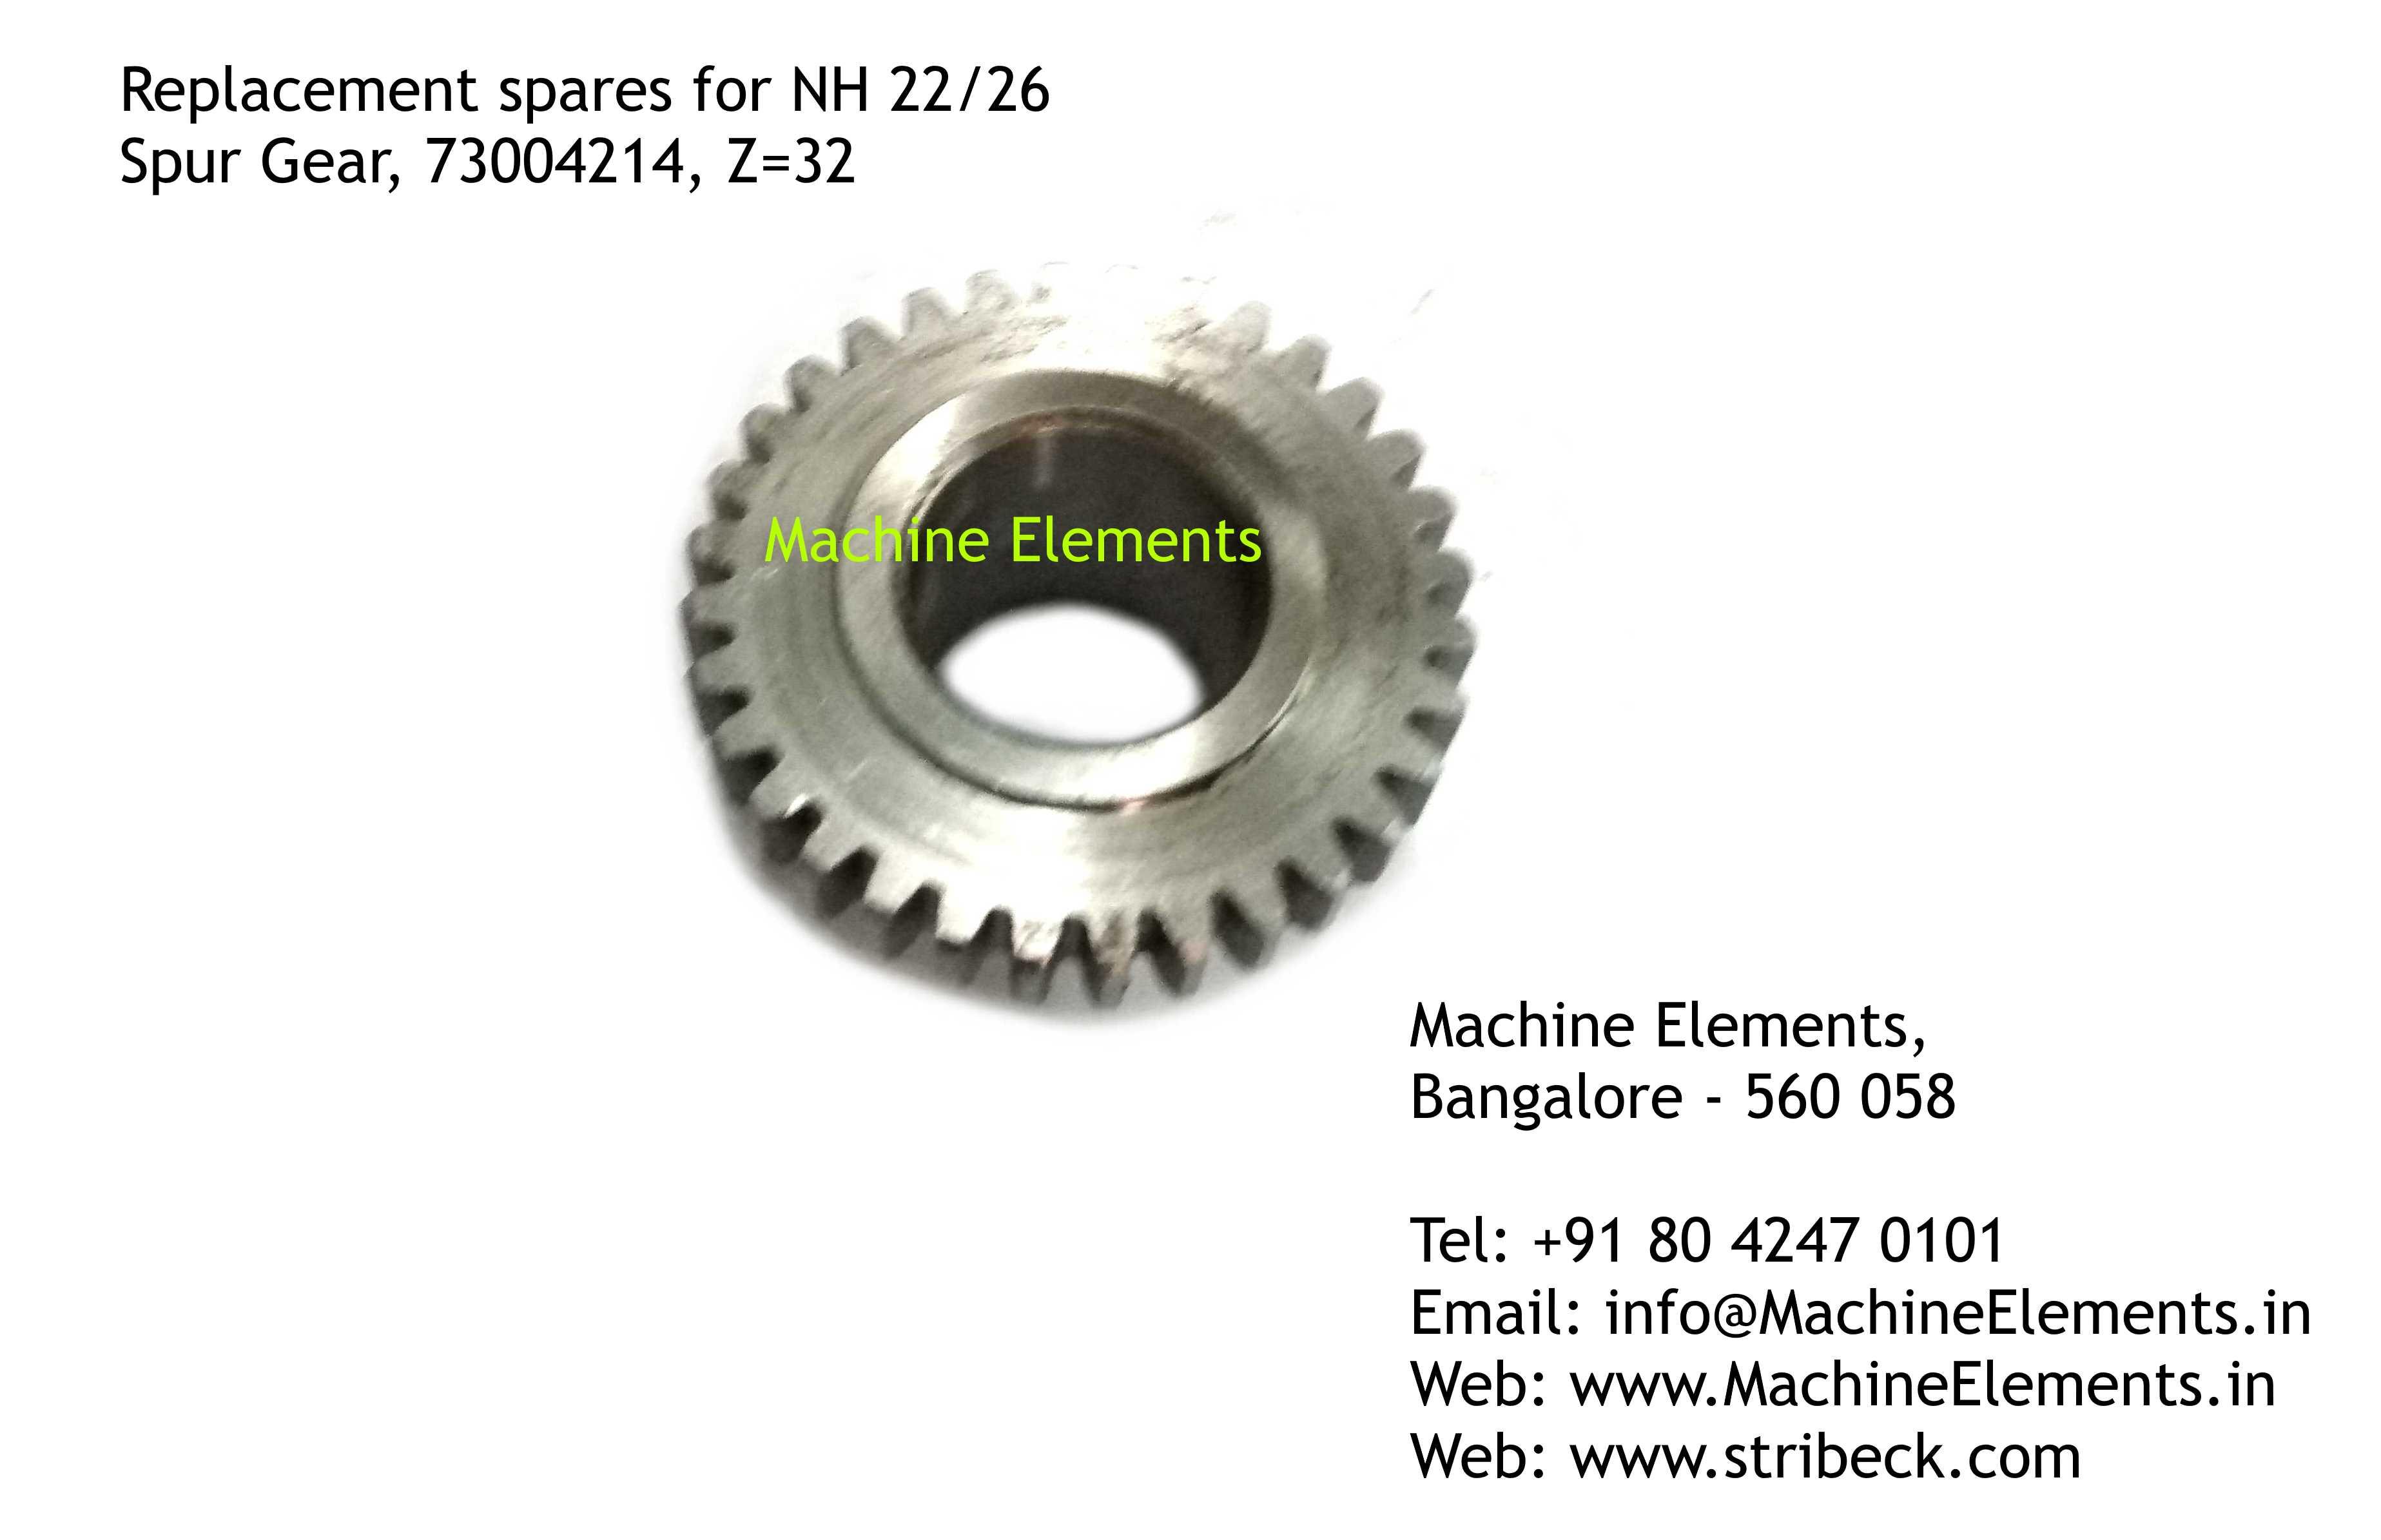 Spur Gear, 73004214, Z=32